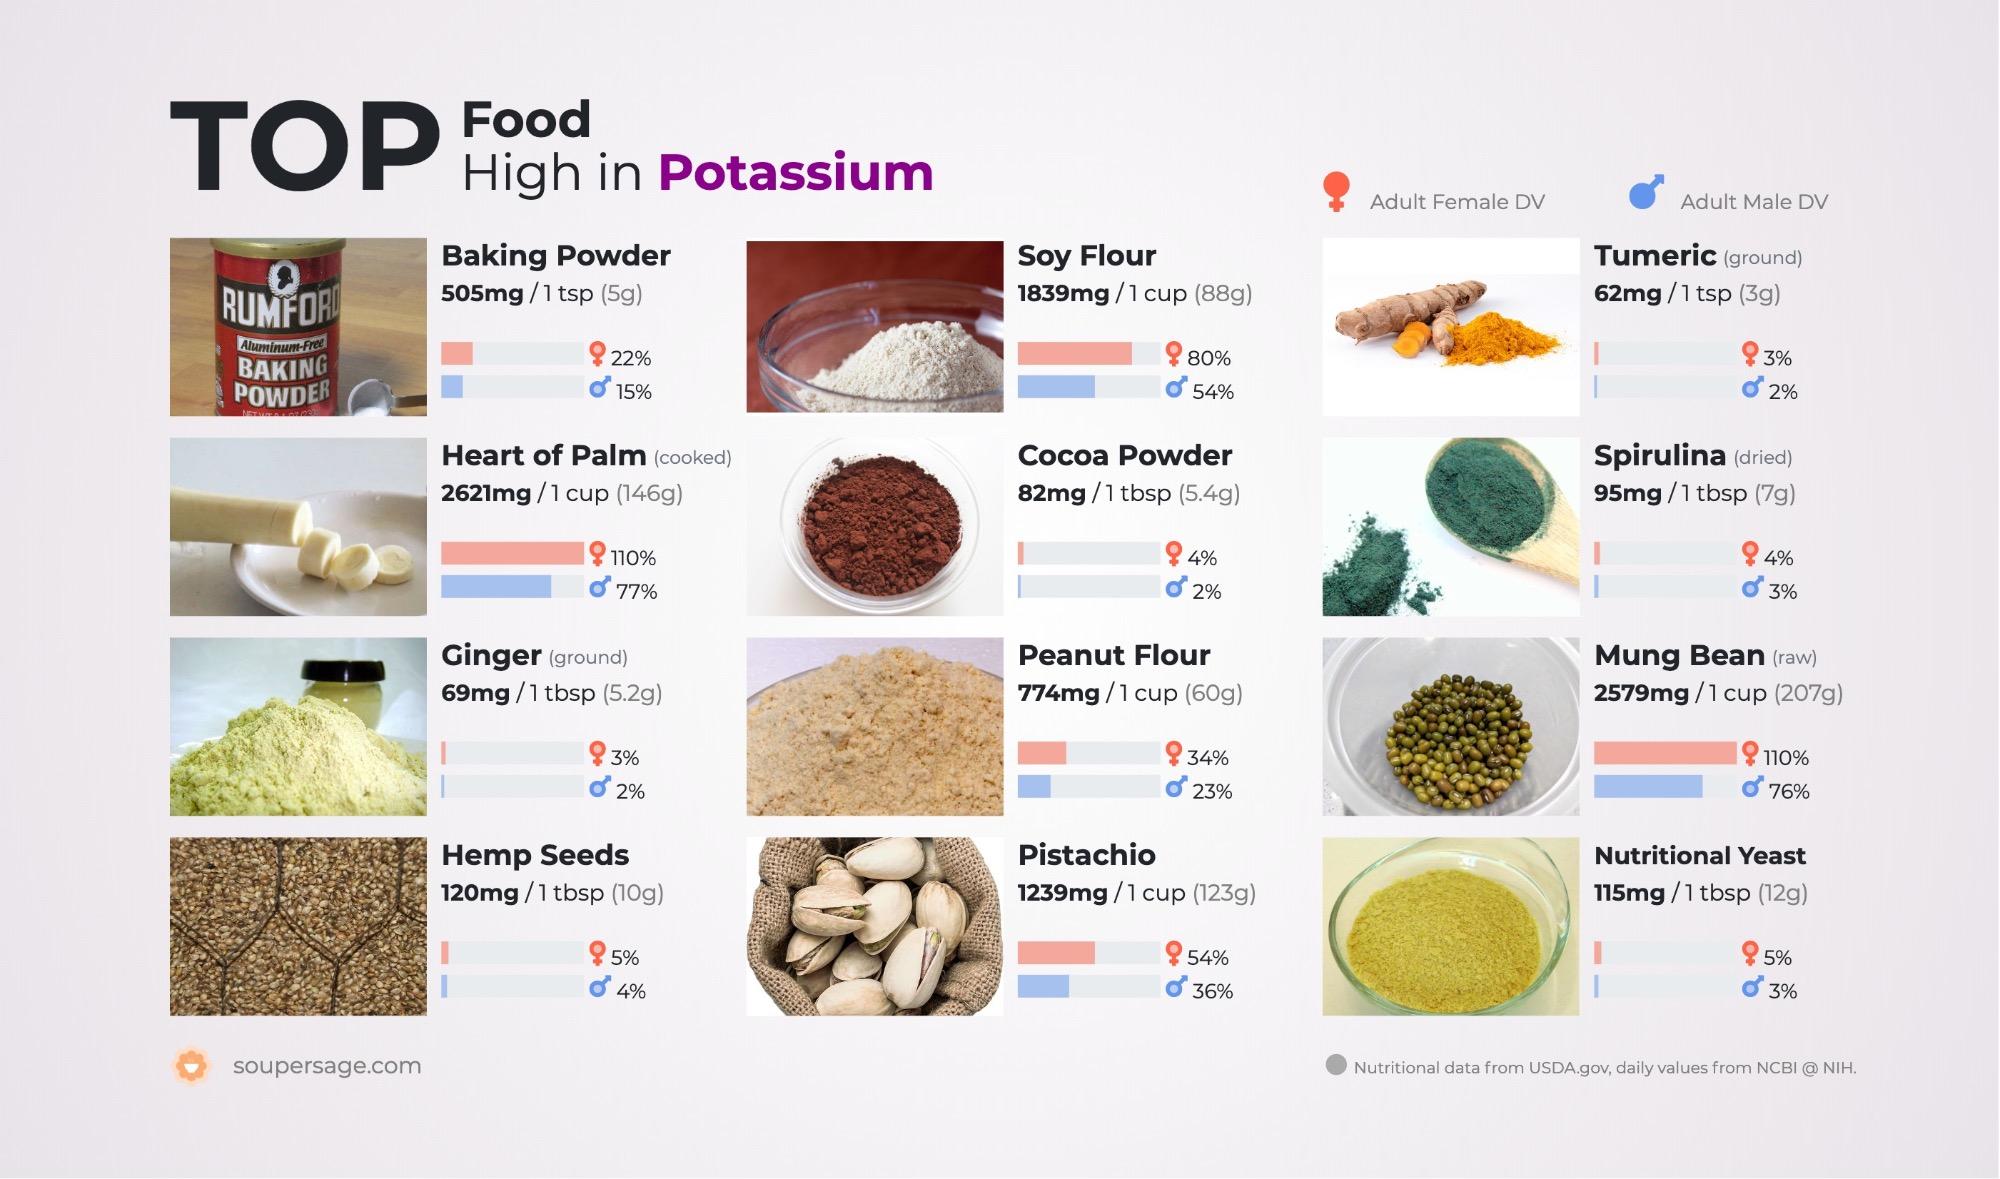 image of Top Food High in Potassium